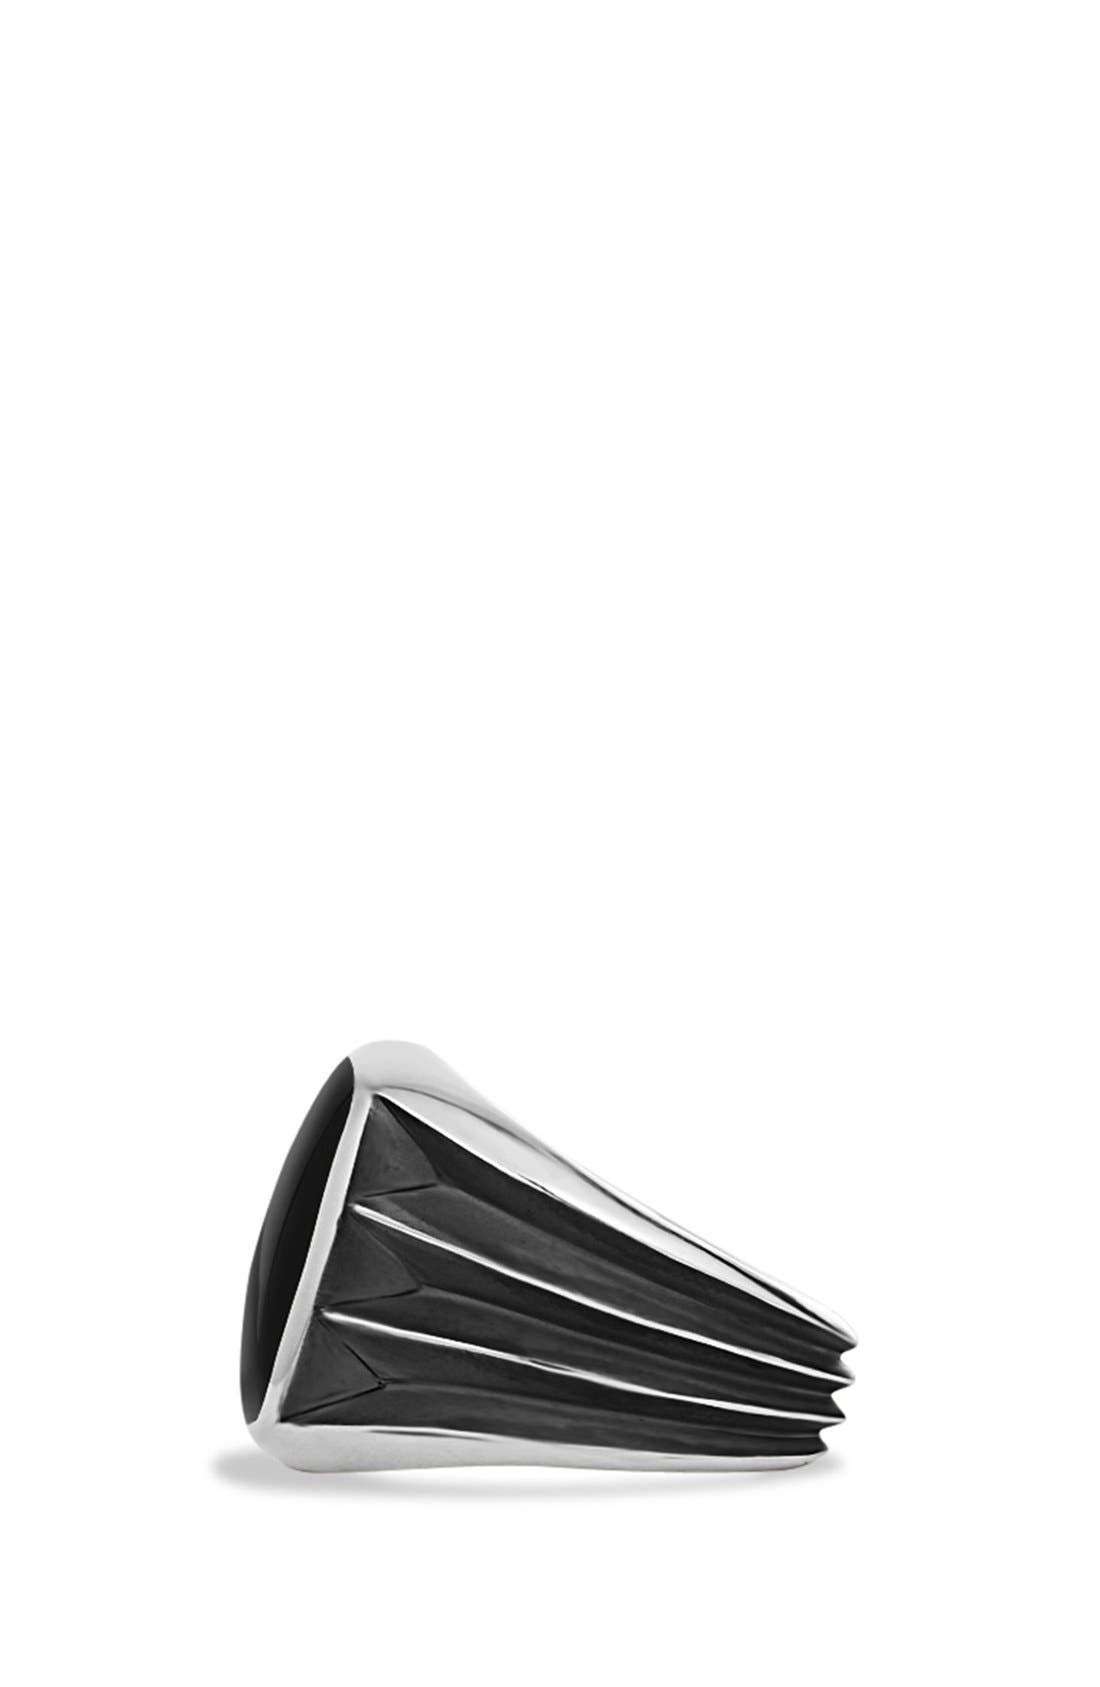 'Royal Cord' Knife Edge Signet Ring with Black Onyx,                             Alternate thumbnail 4, color,                             Black Onyx